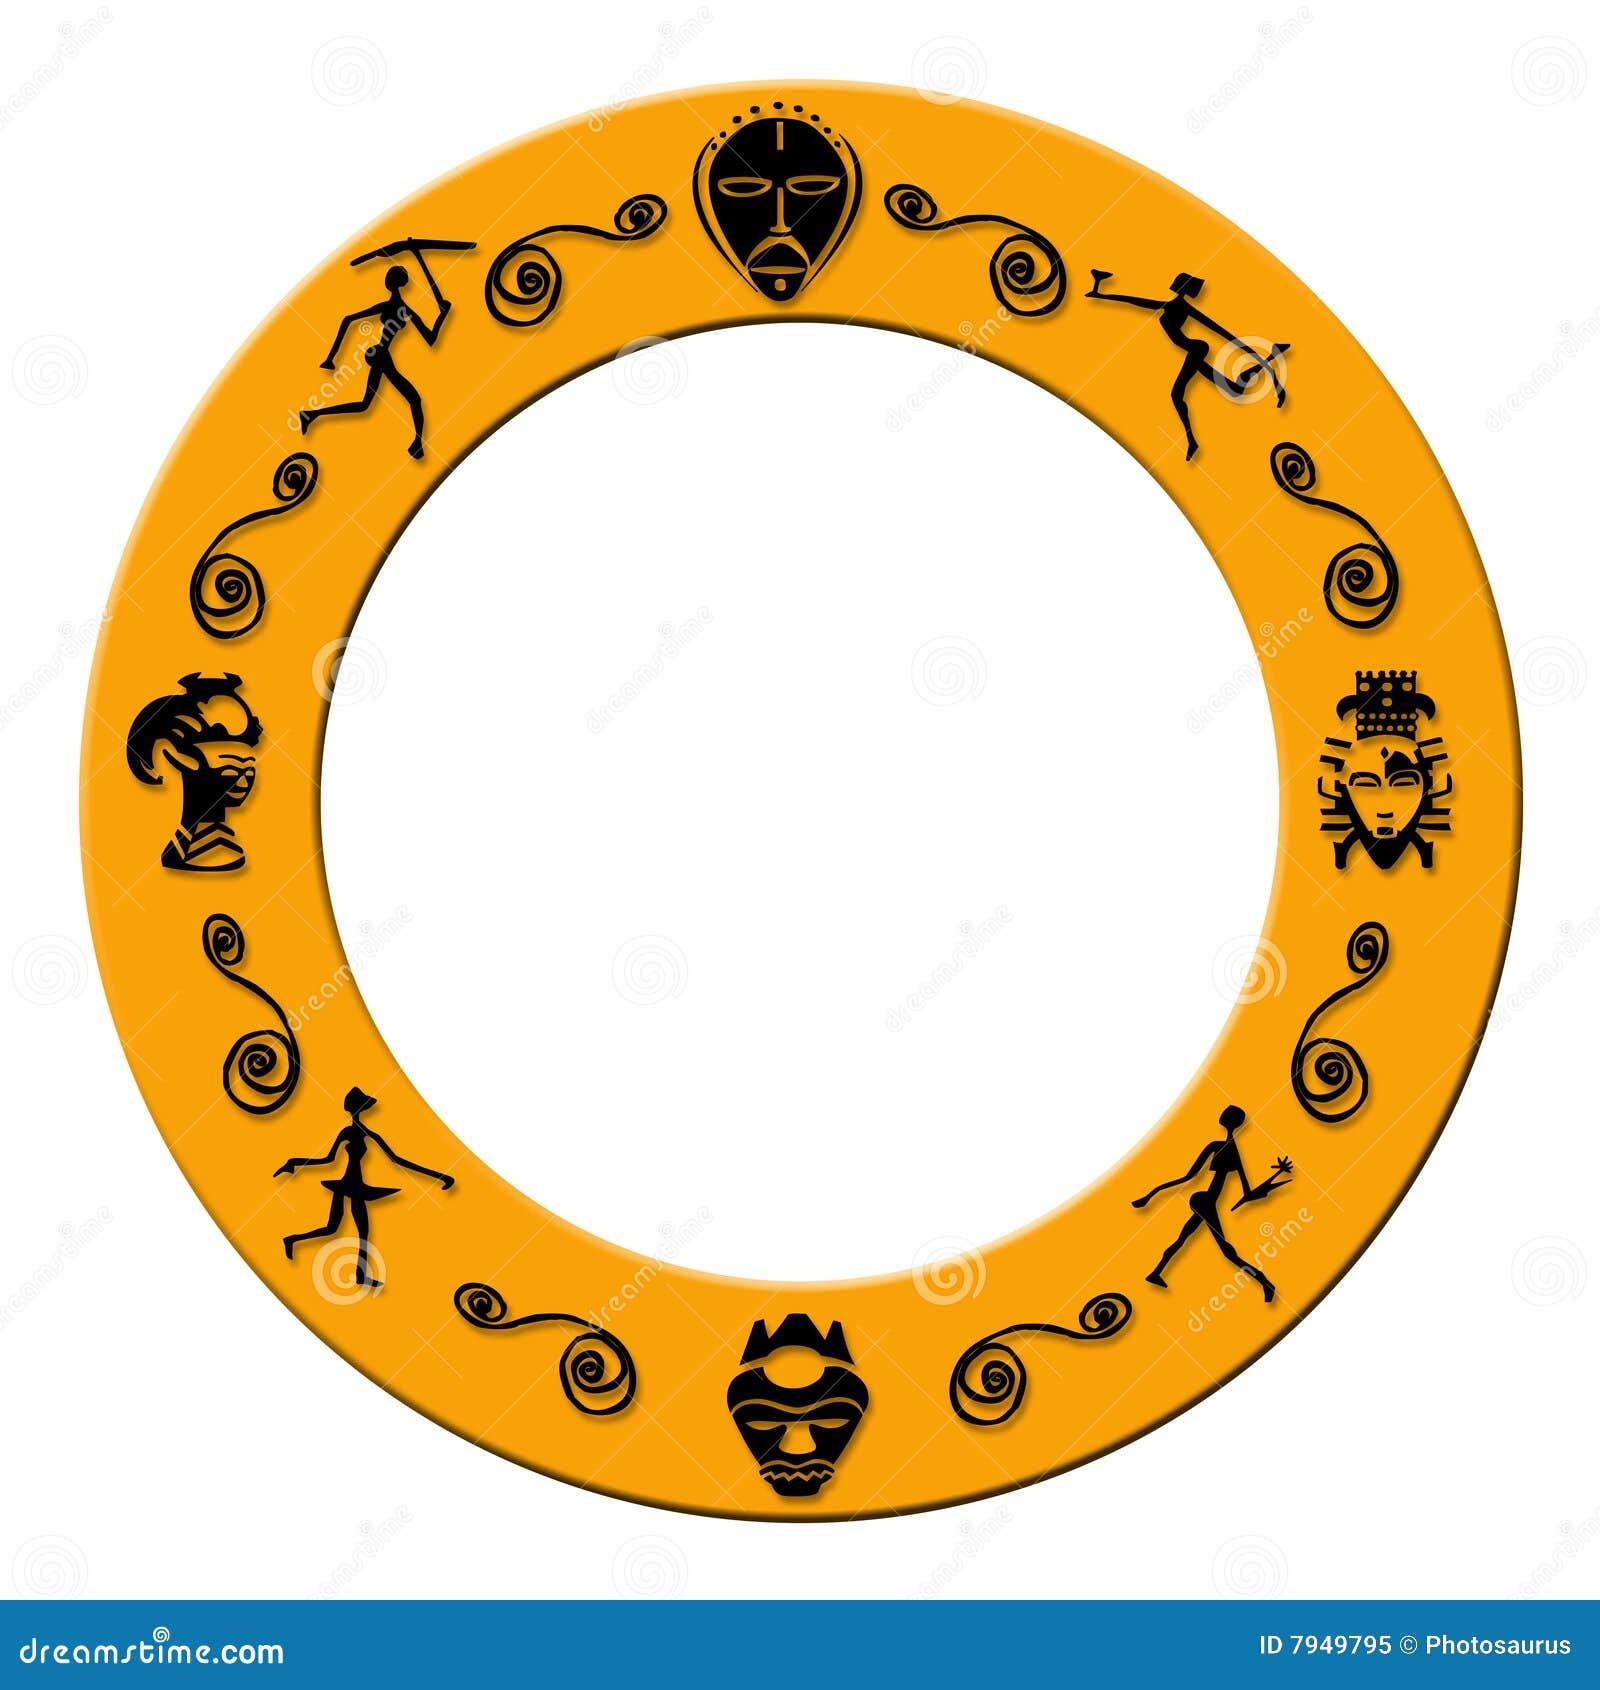 Round african border stock illustration. Illustration of conceptual ...